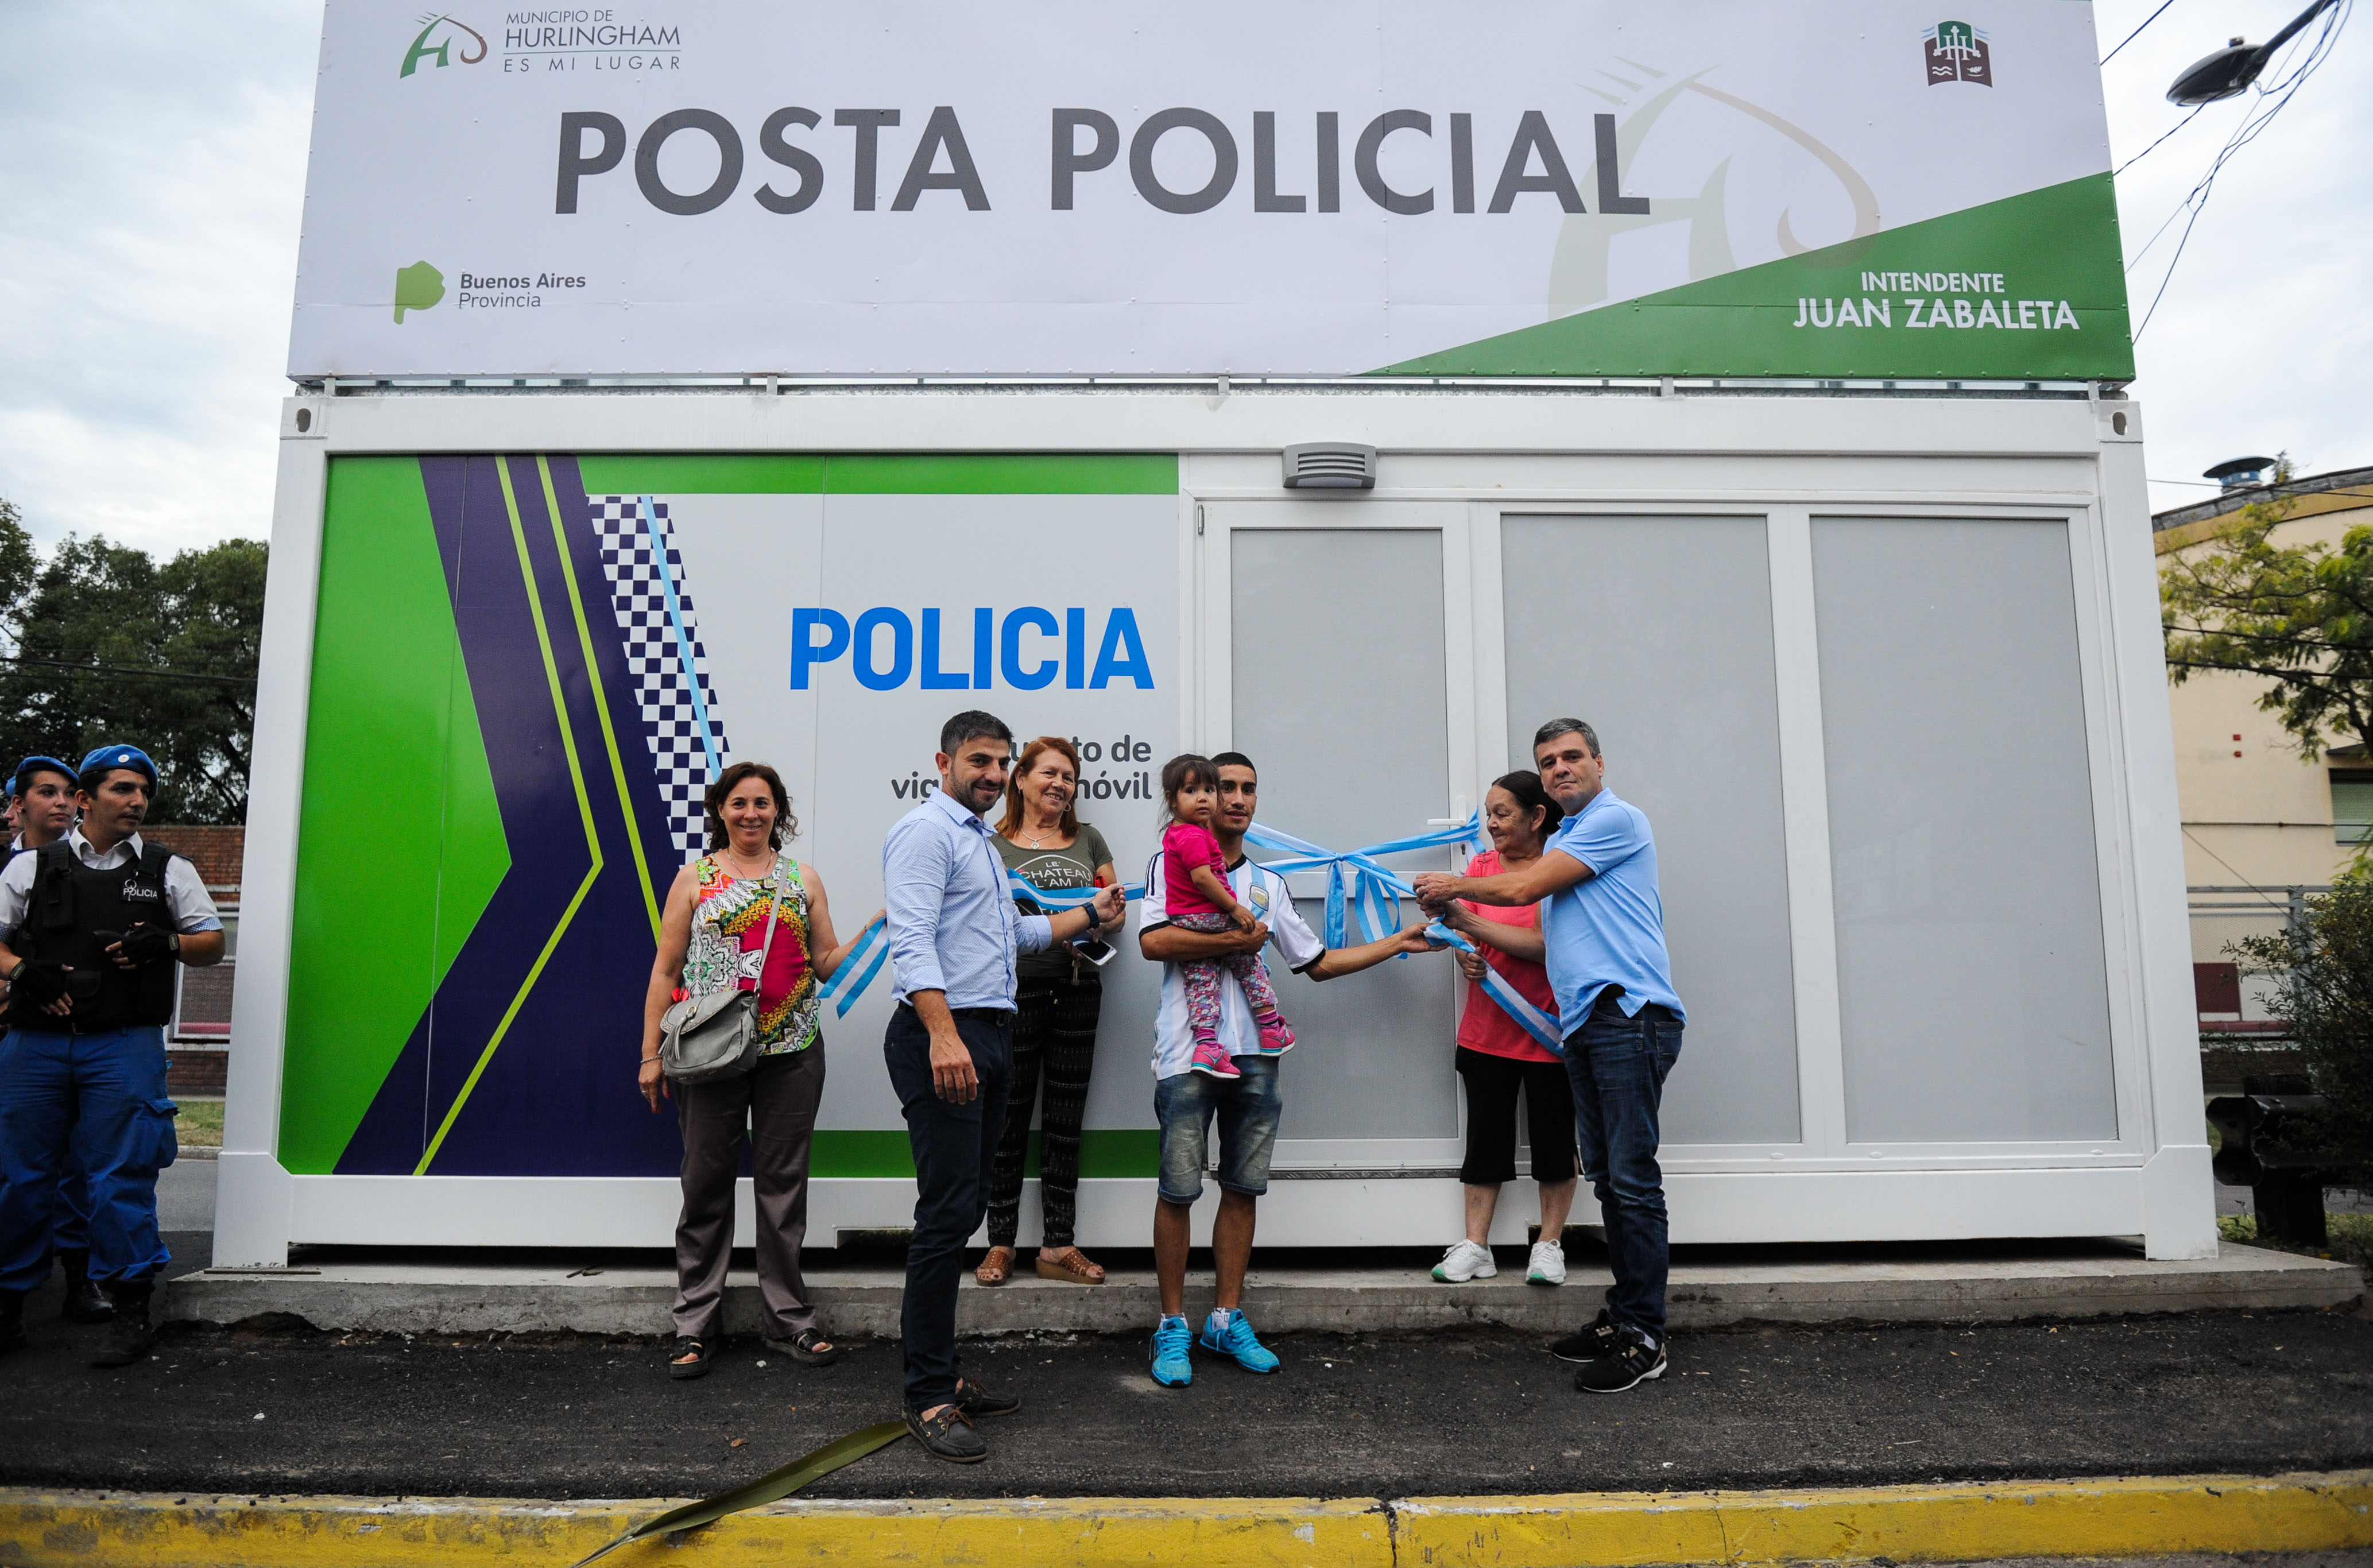 posta policial